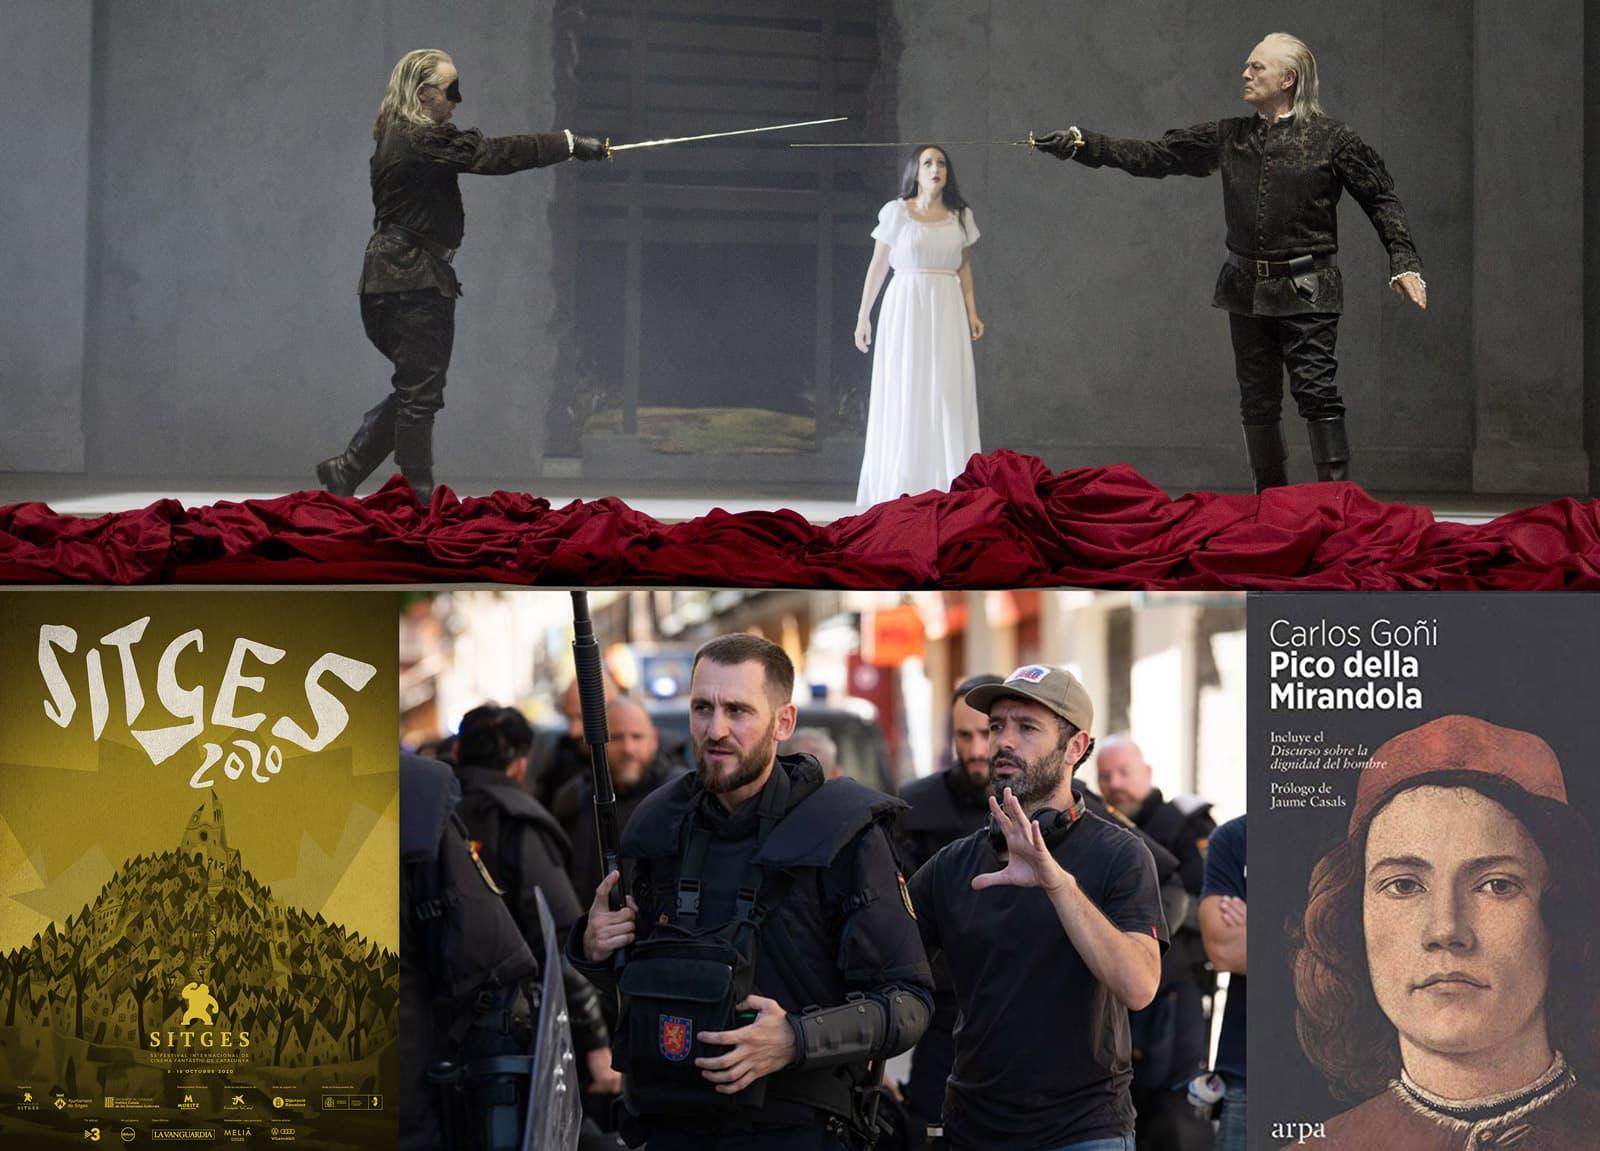 Ópera Don Giovanni al Liceu, cartell del Festival Internacional de Cinema Fantàstic de Sitges, serie Antidisturbios i llibre Pico della Mirandola de Carlos Goñi